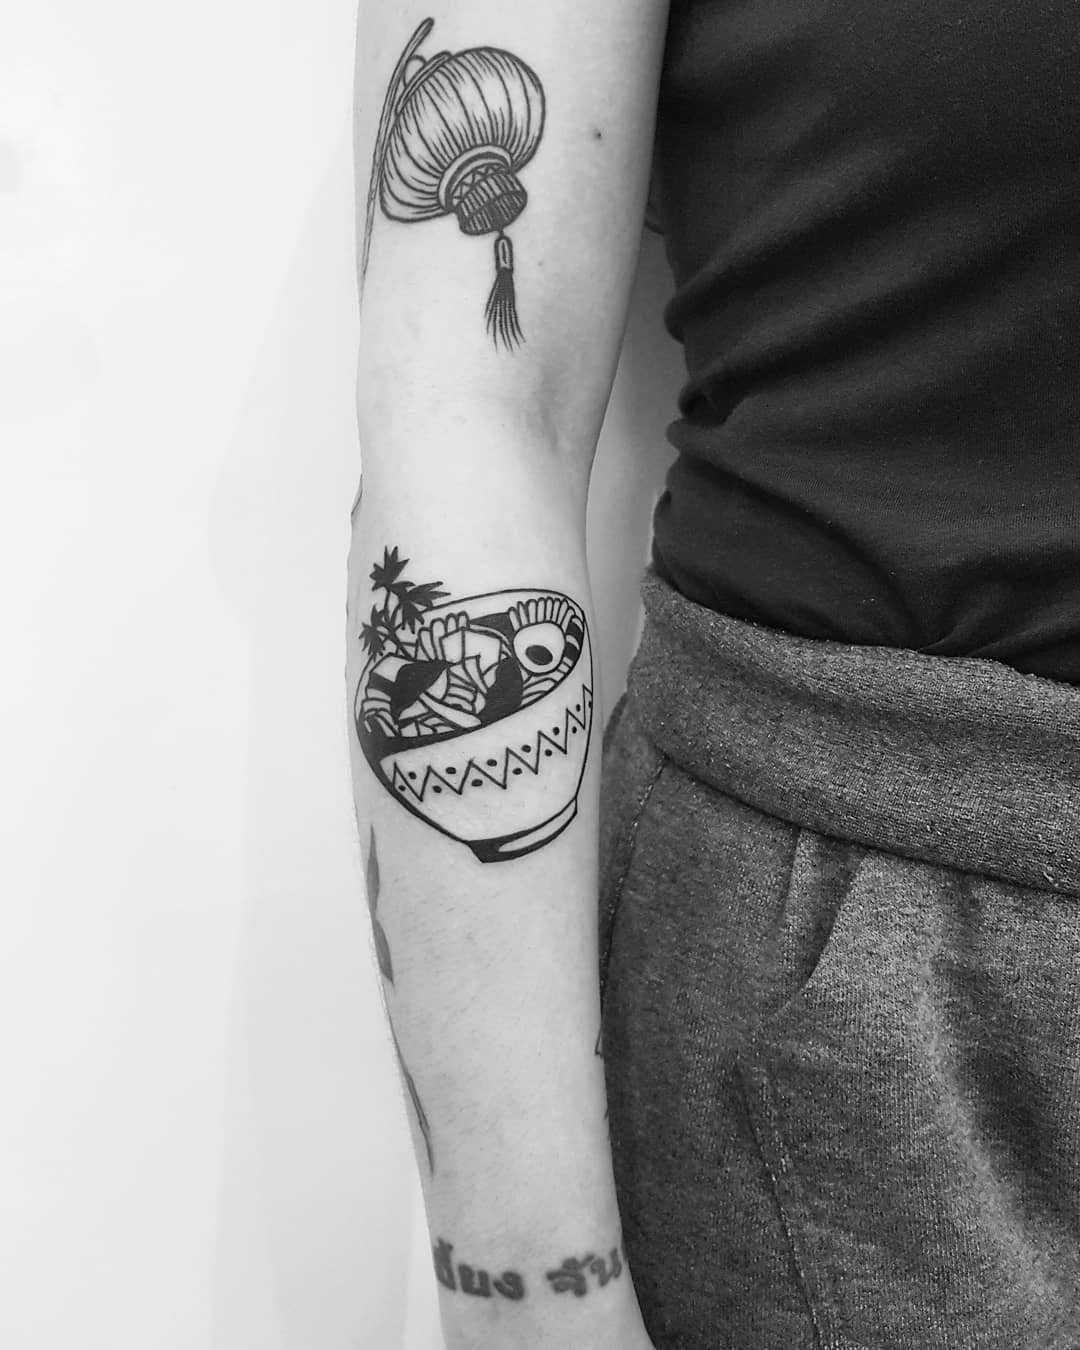 Mango sticky rice tattoo | Tattoos